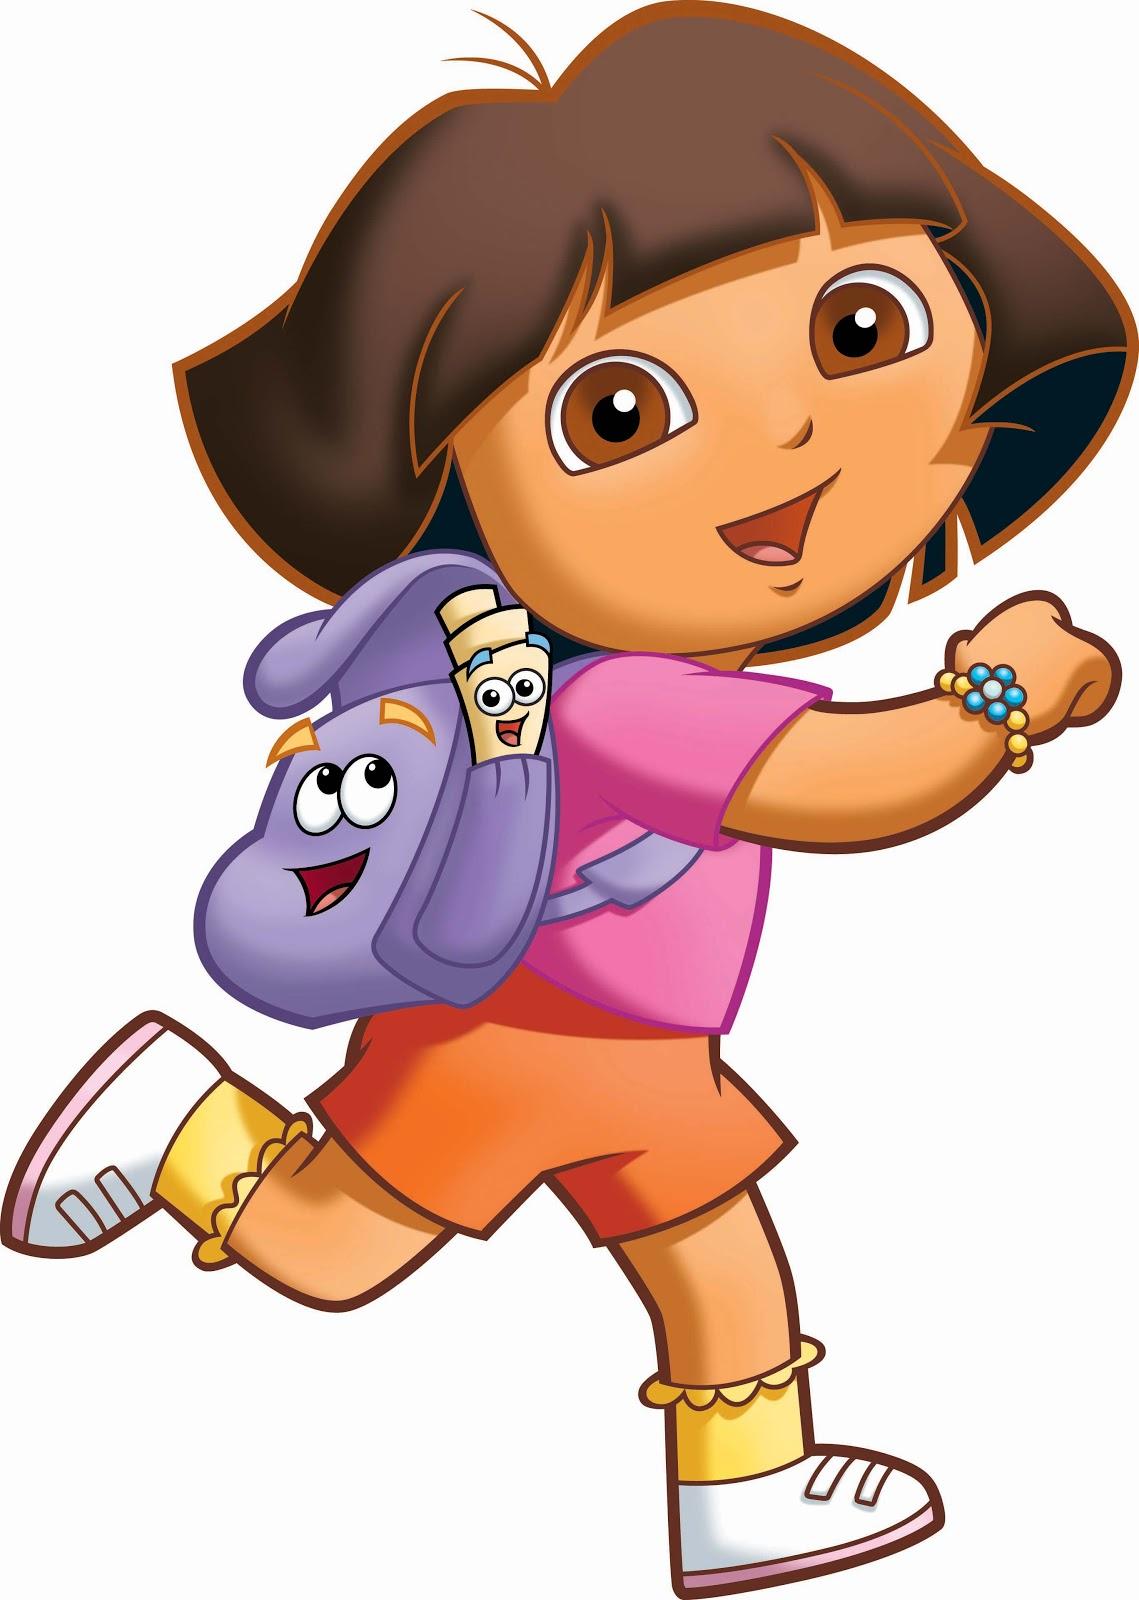 Dora shambles clipart free clipart images image #18516.